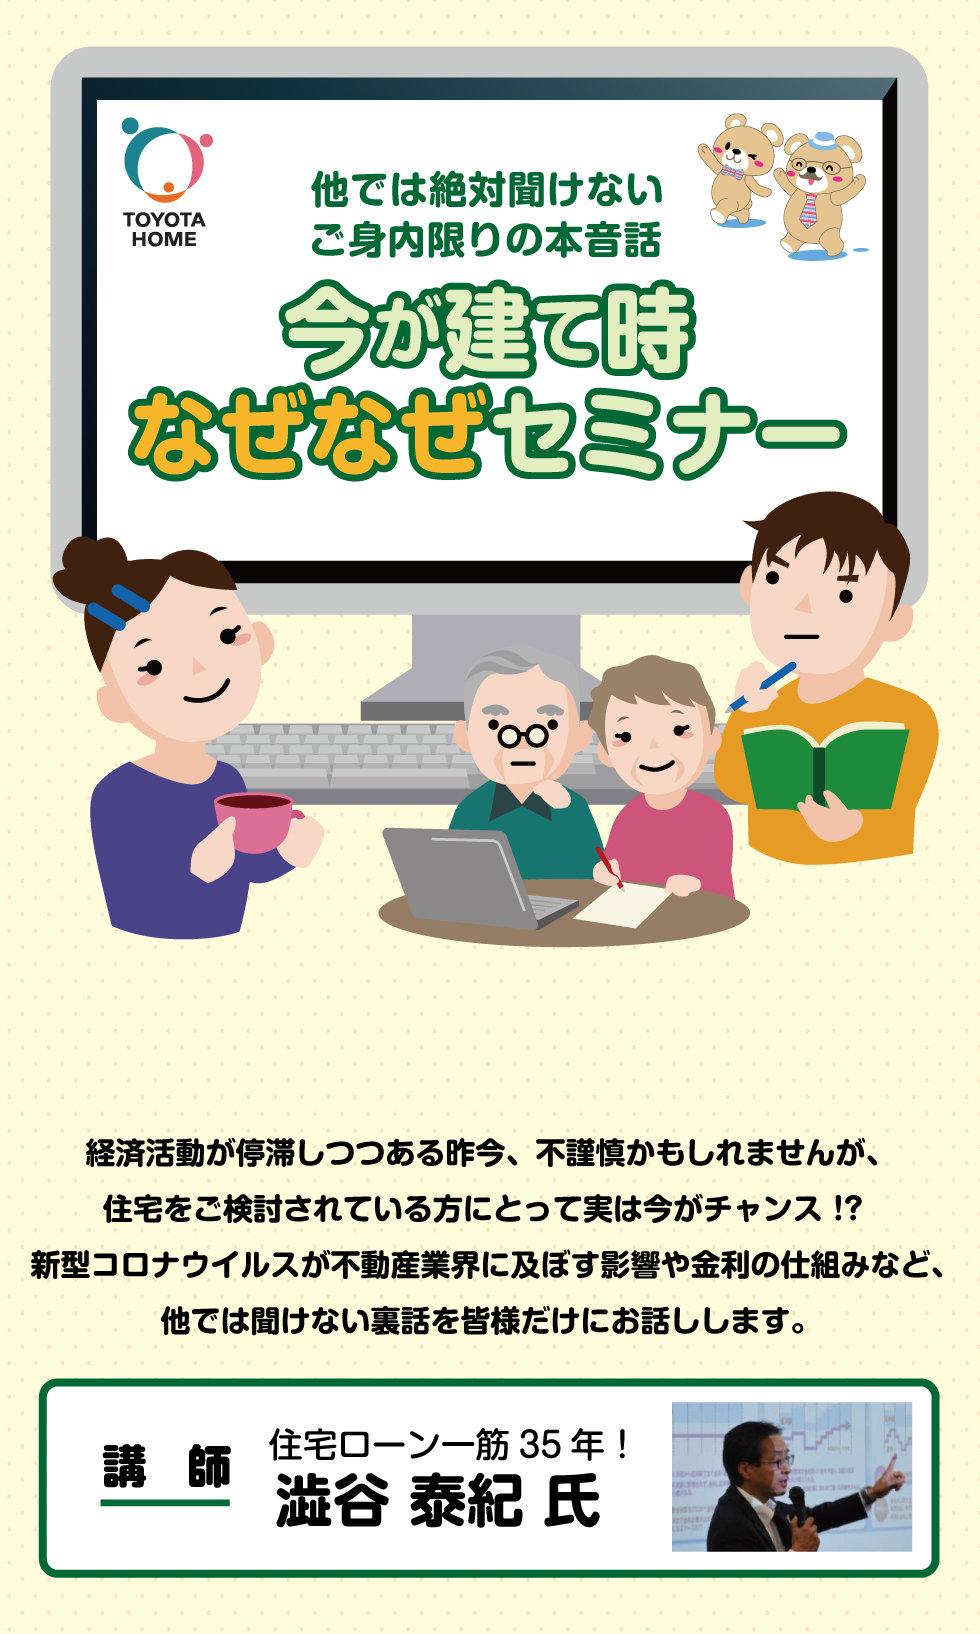 toyotaweblp.jpg